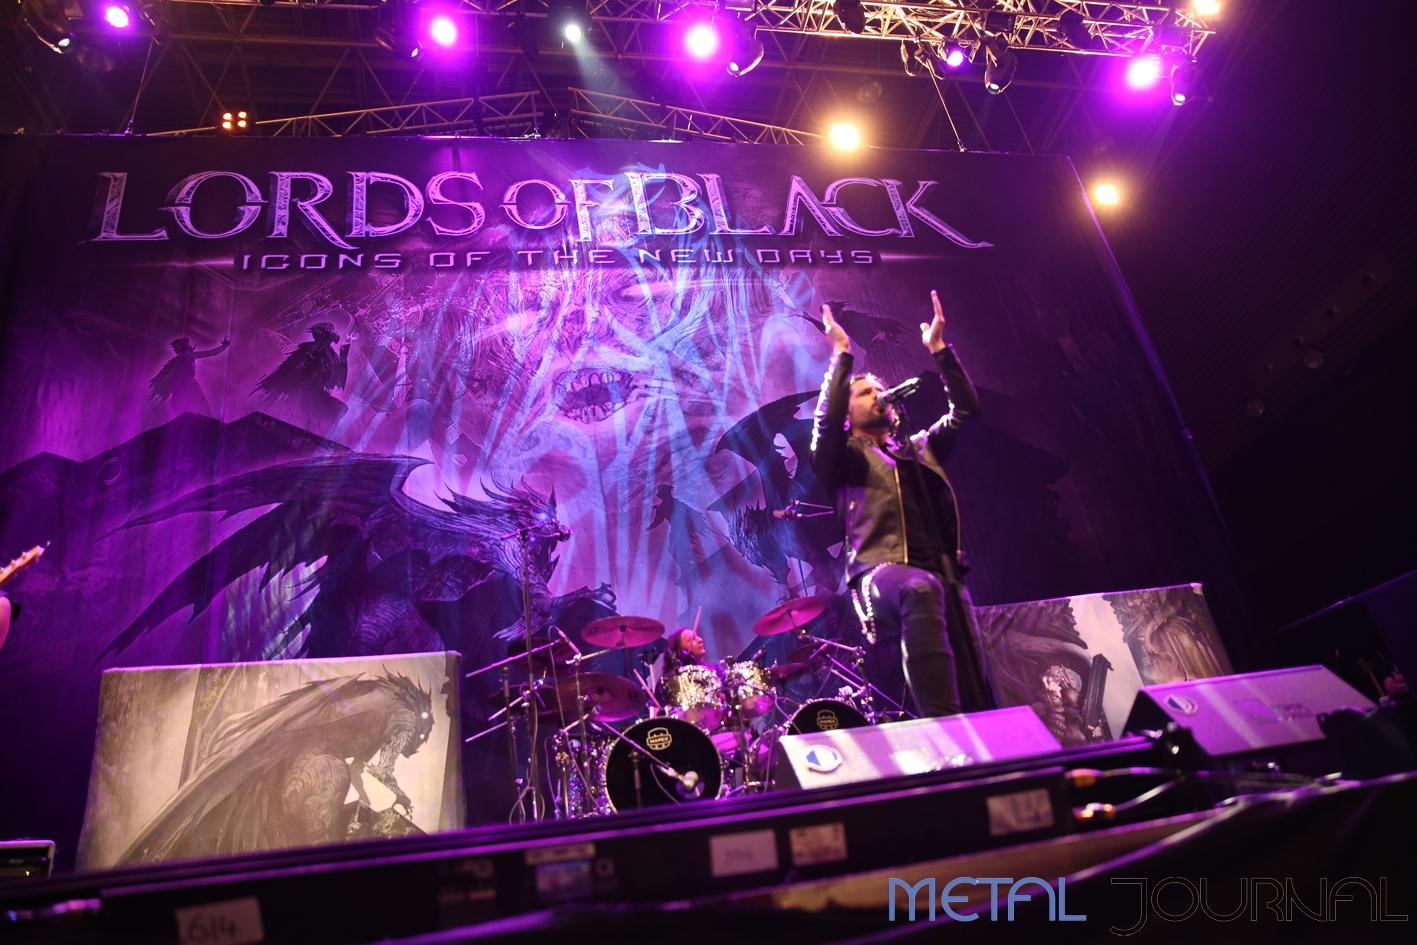 lords of black - metal journal barakaldo 2018 pic 4